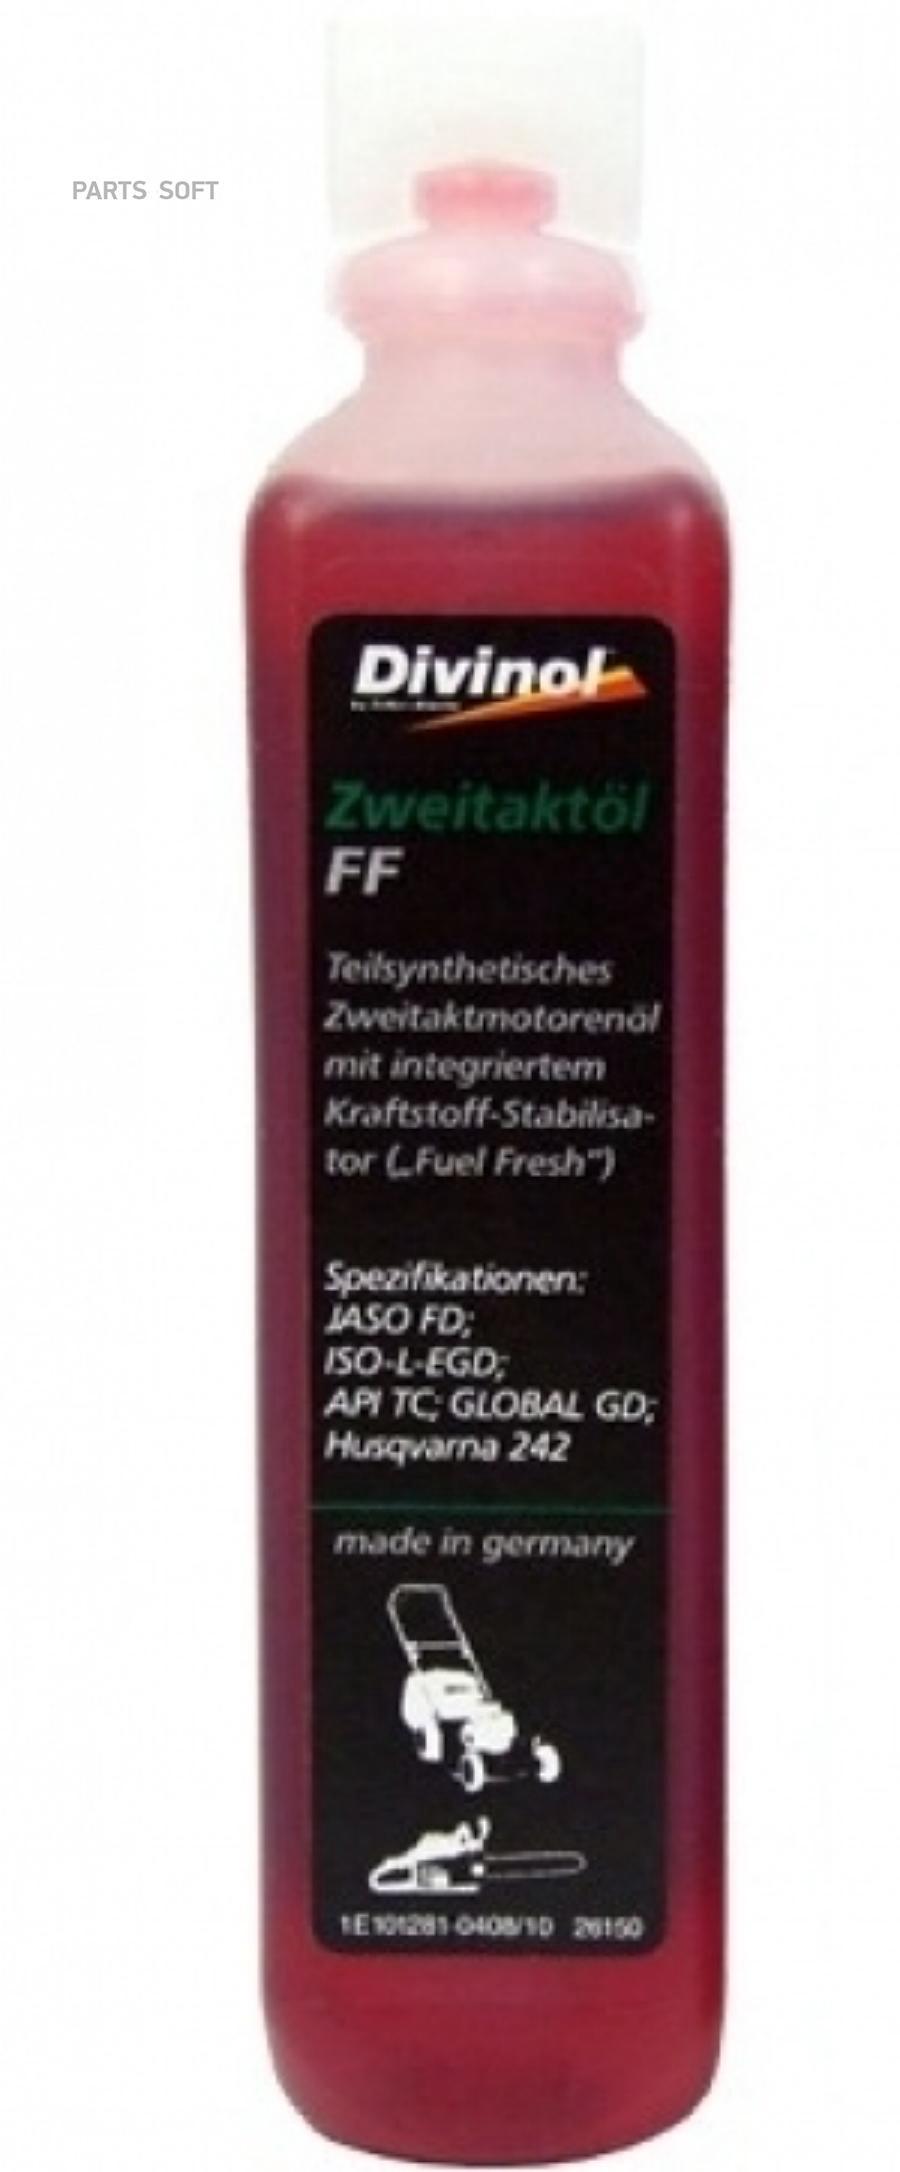 Моторное масло Zweitaktoel FF